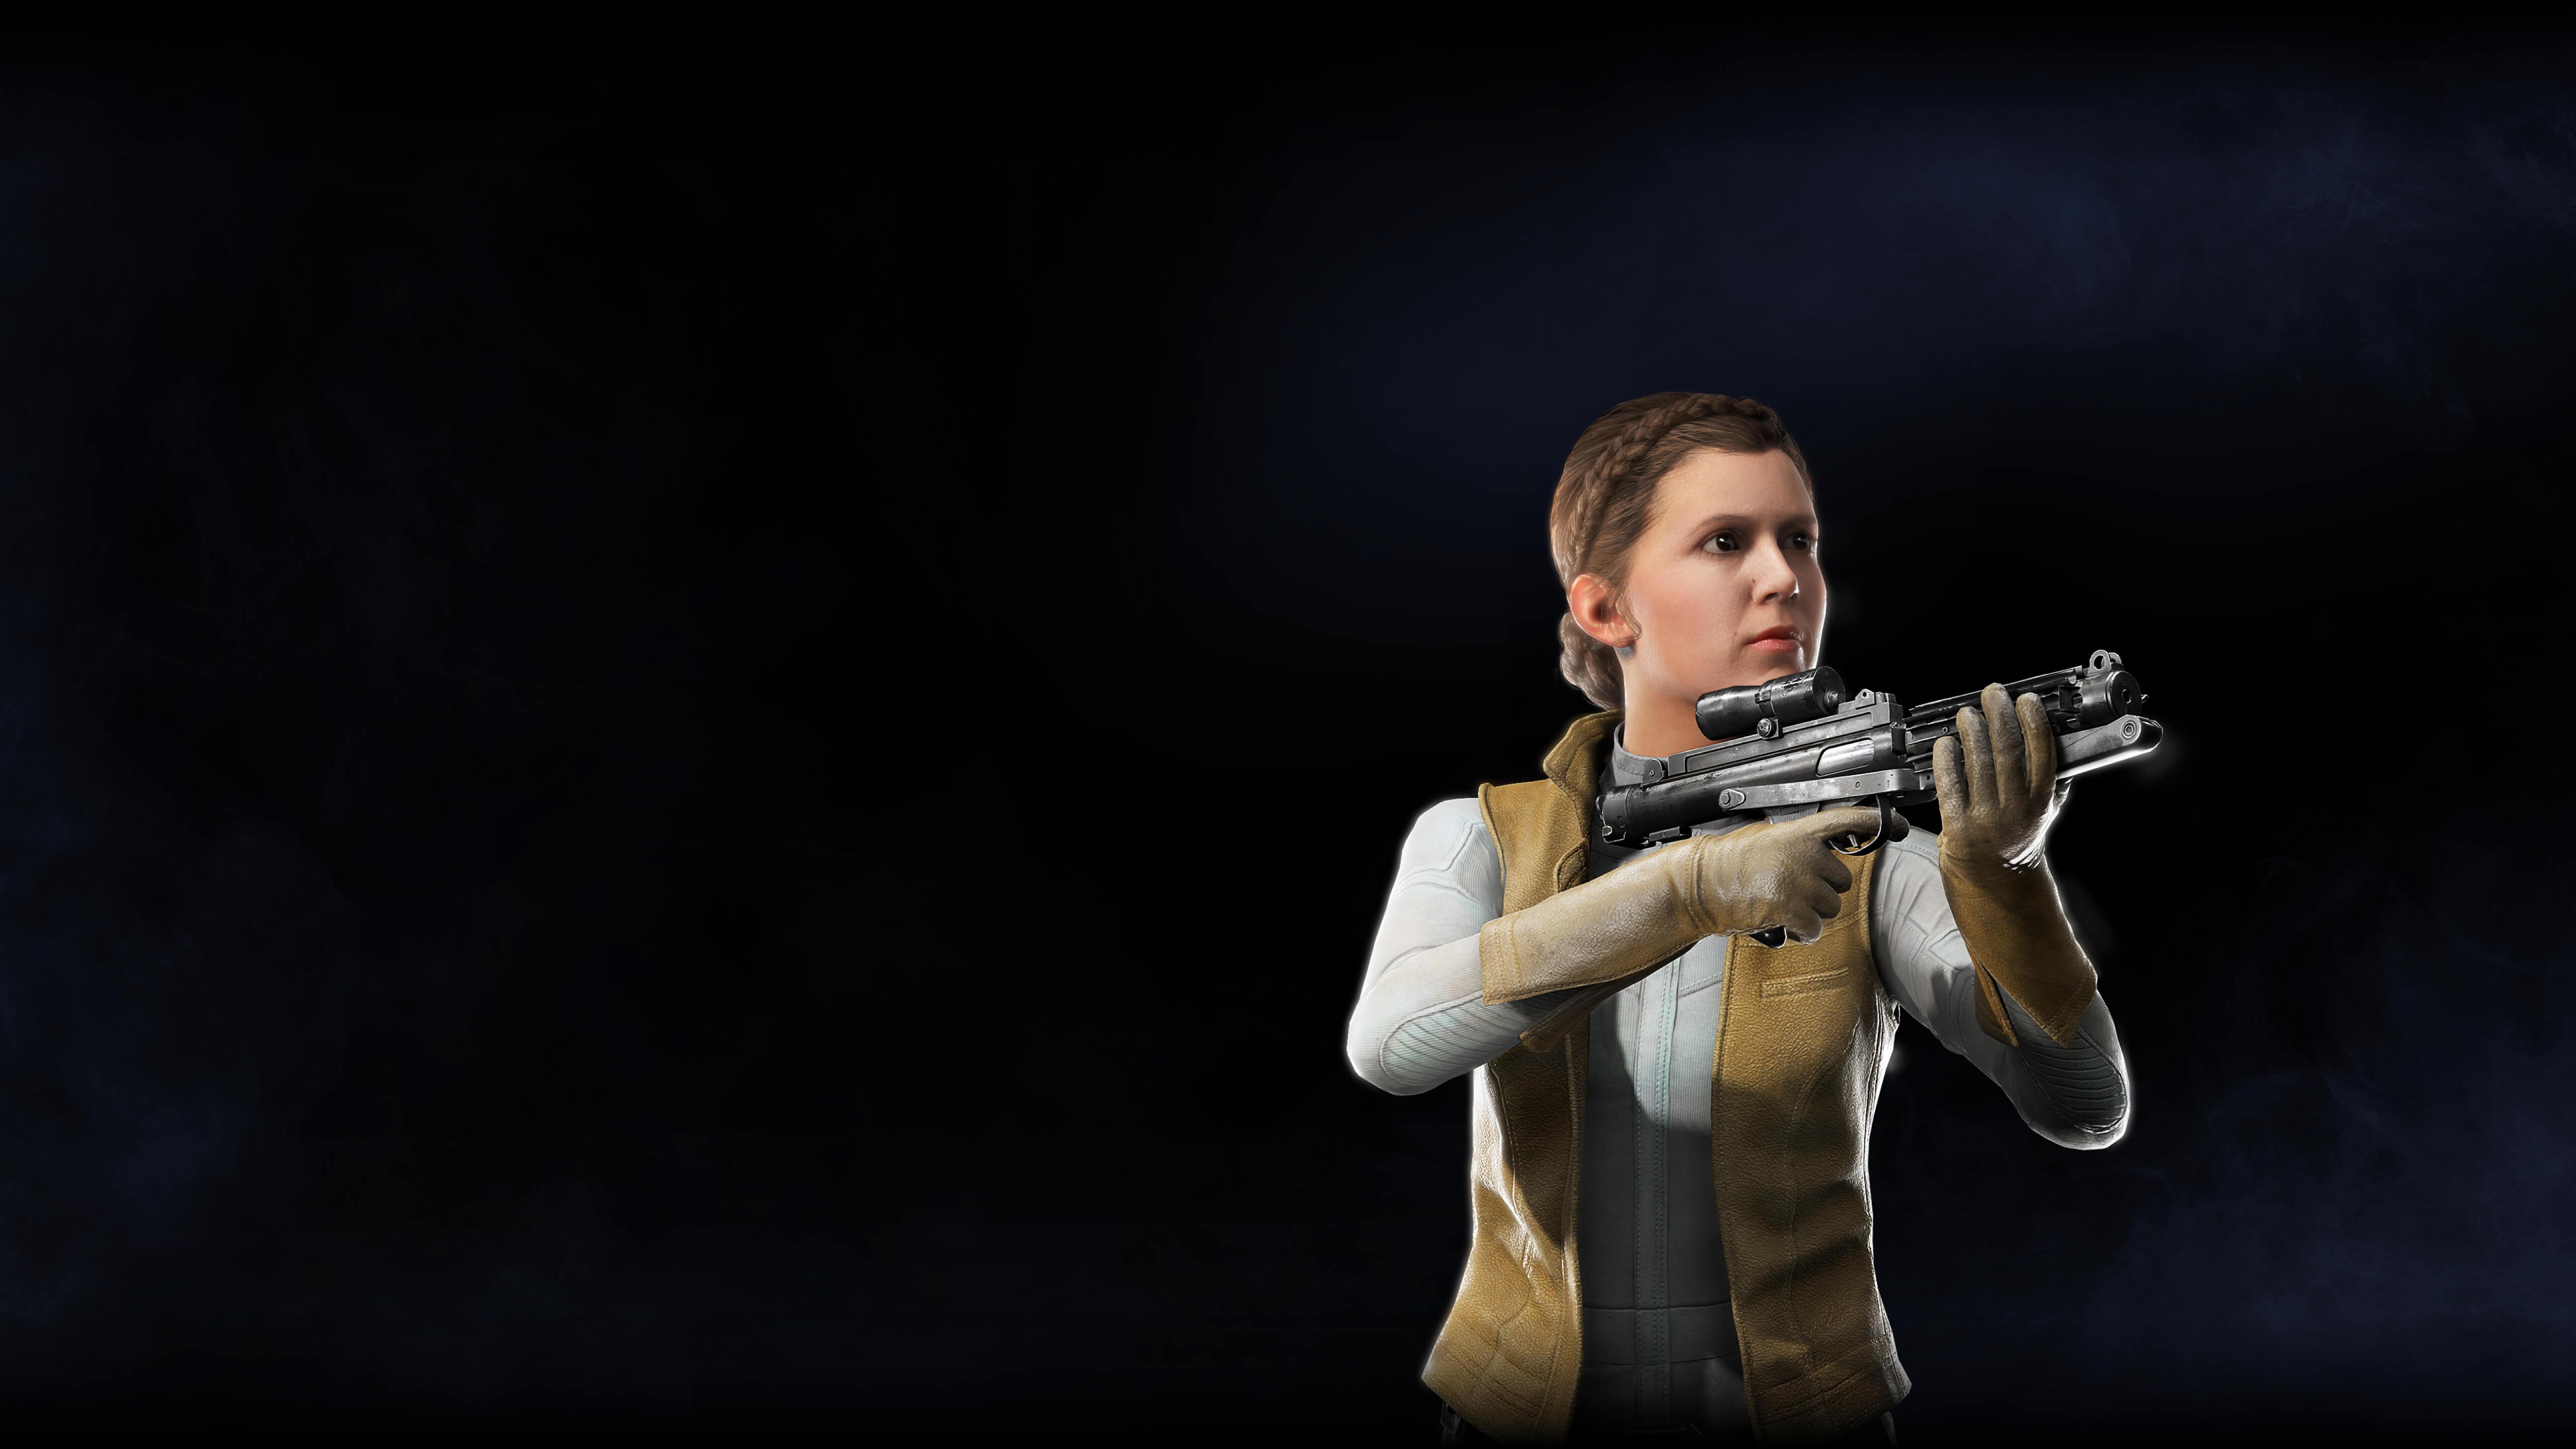 1440x2560 Princess Leia Star Wars Battlefront II 2017 ...